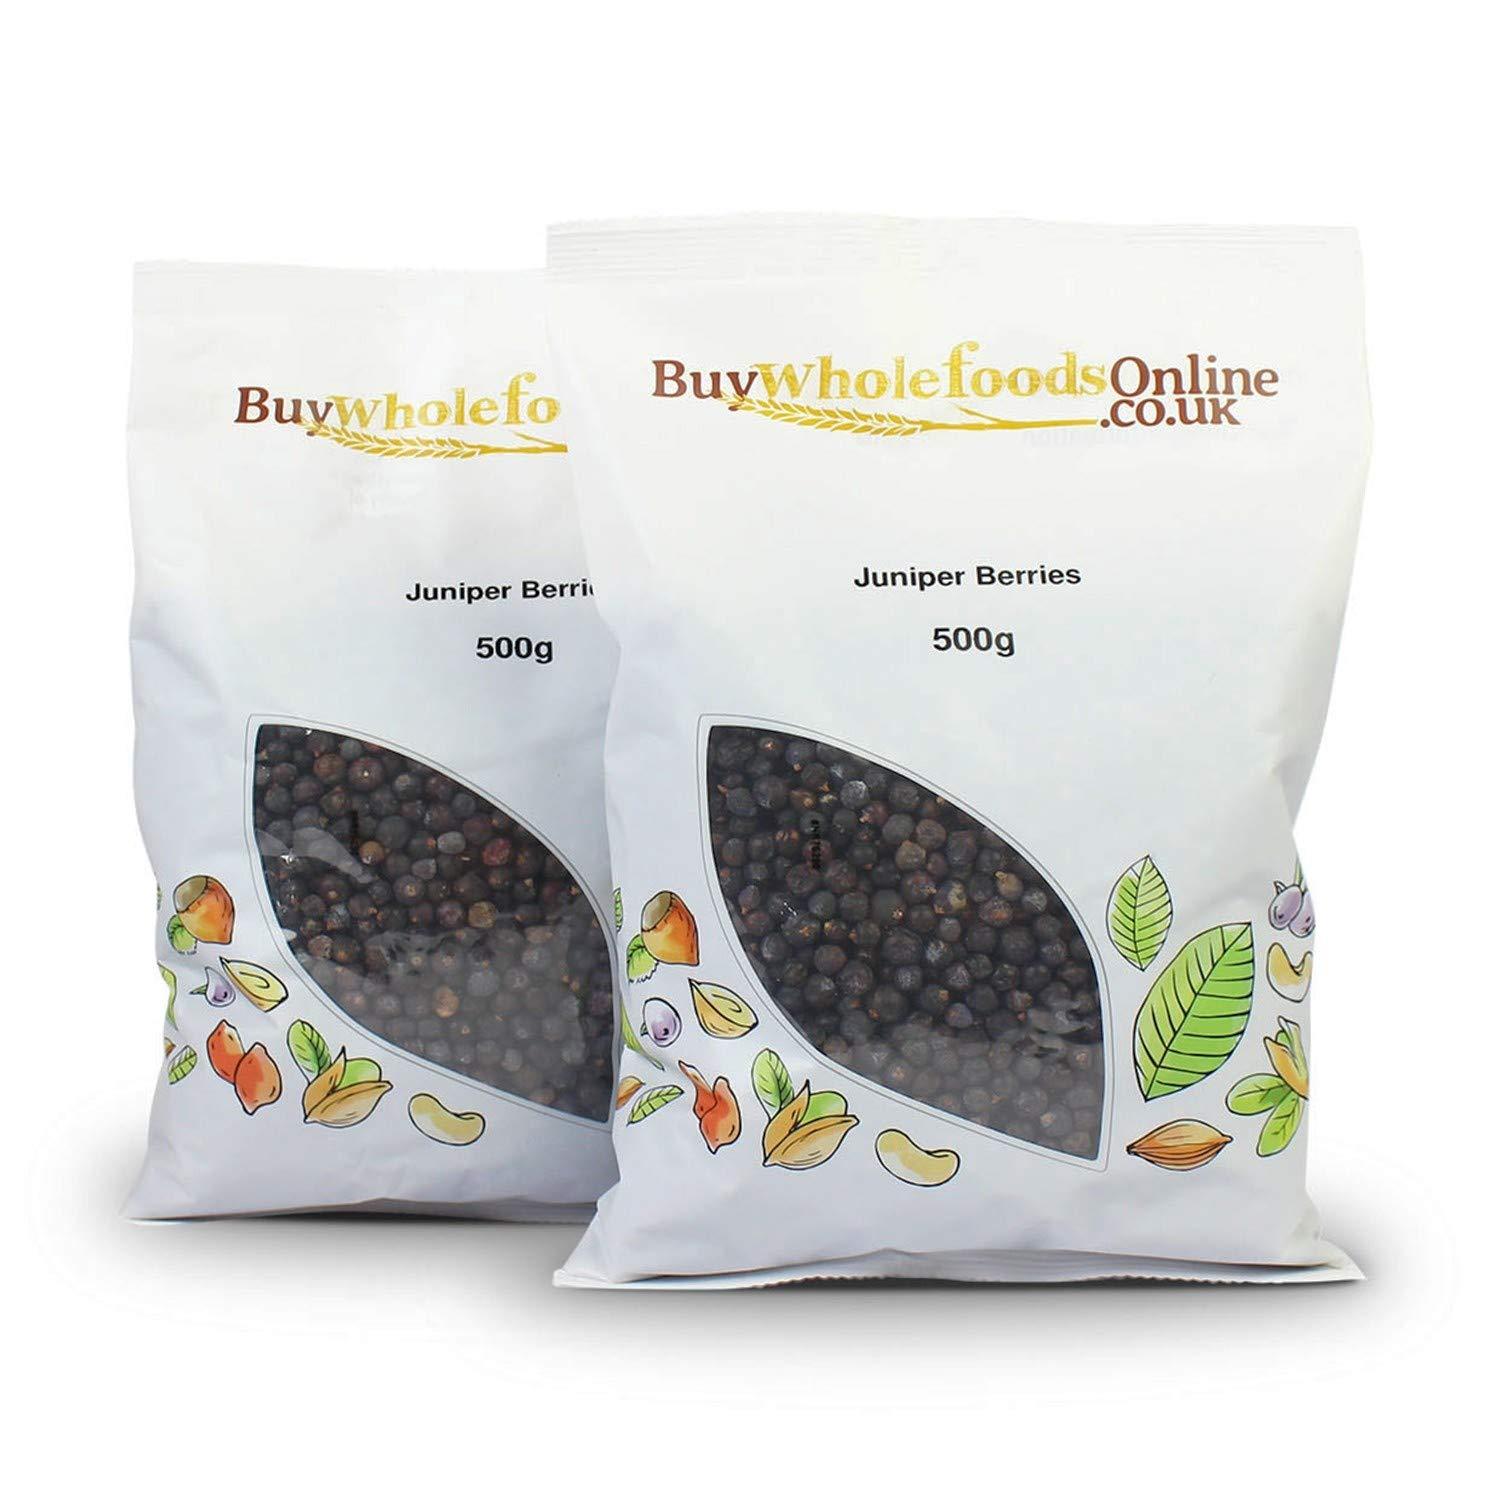 Juniper Berries 1kg (Buy Whole Foods Online Ltd.)